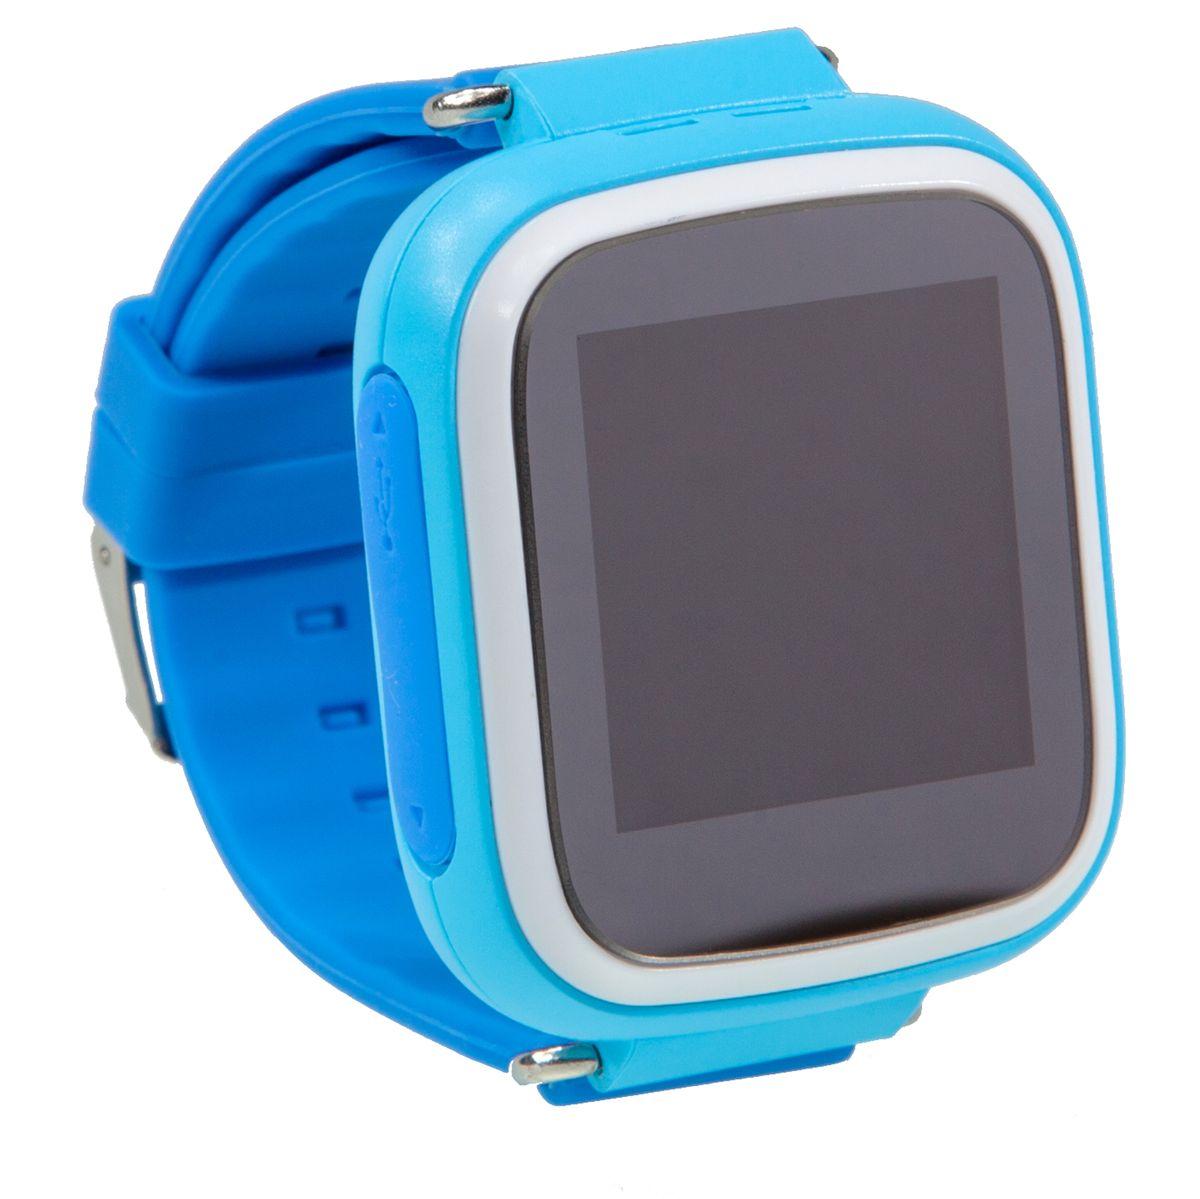 Prolike PLSW523, Light Blue умные детские часы